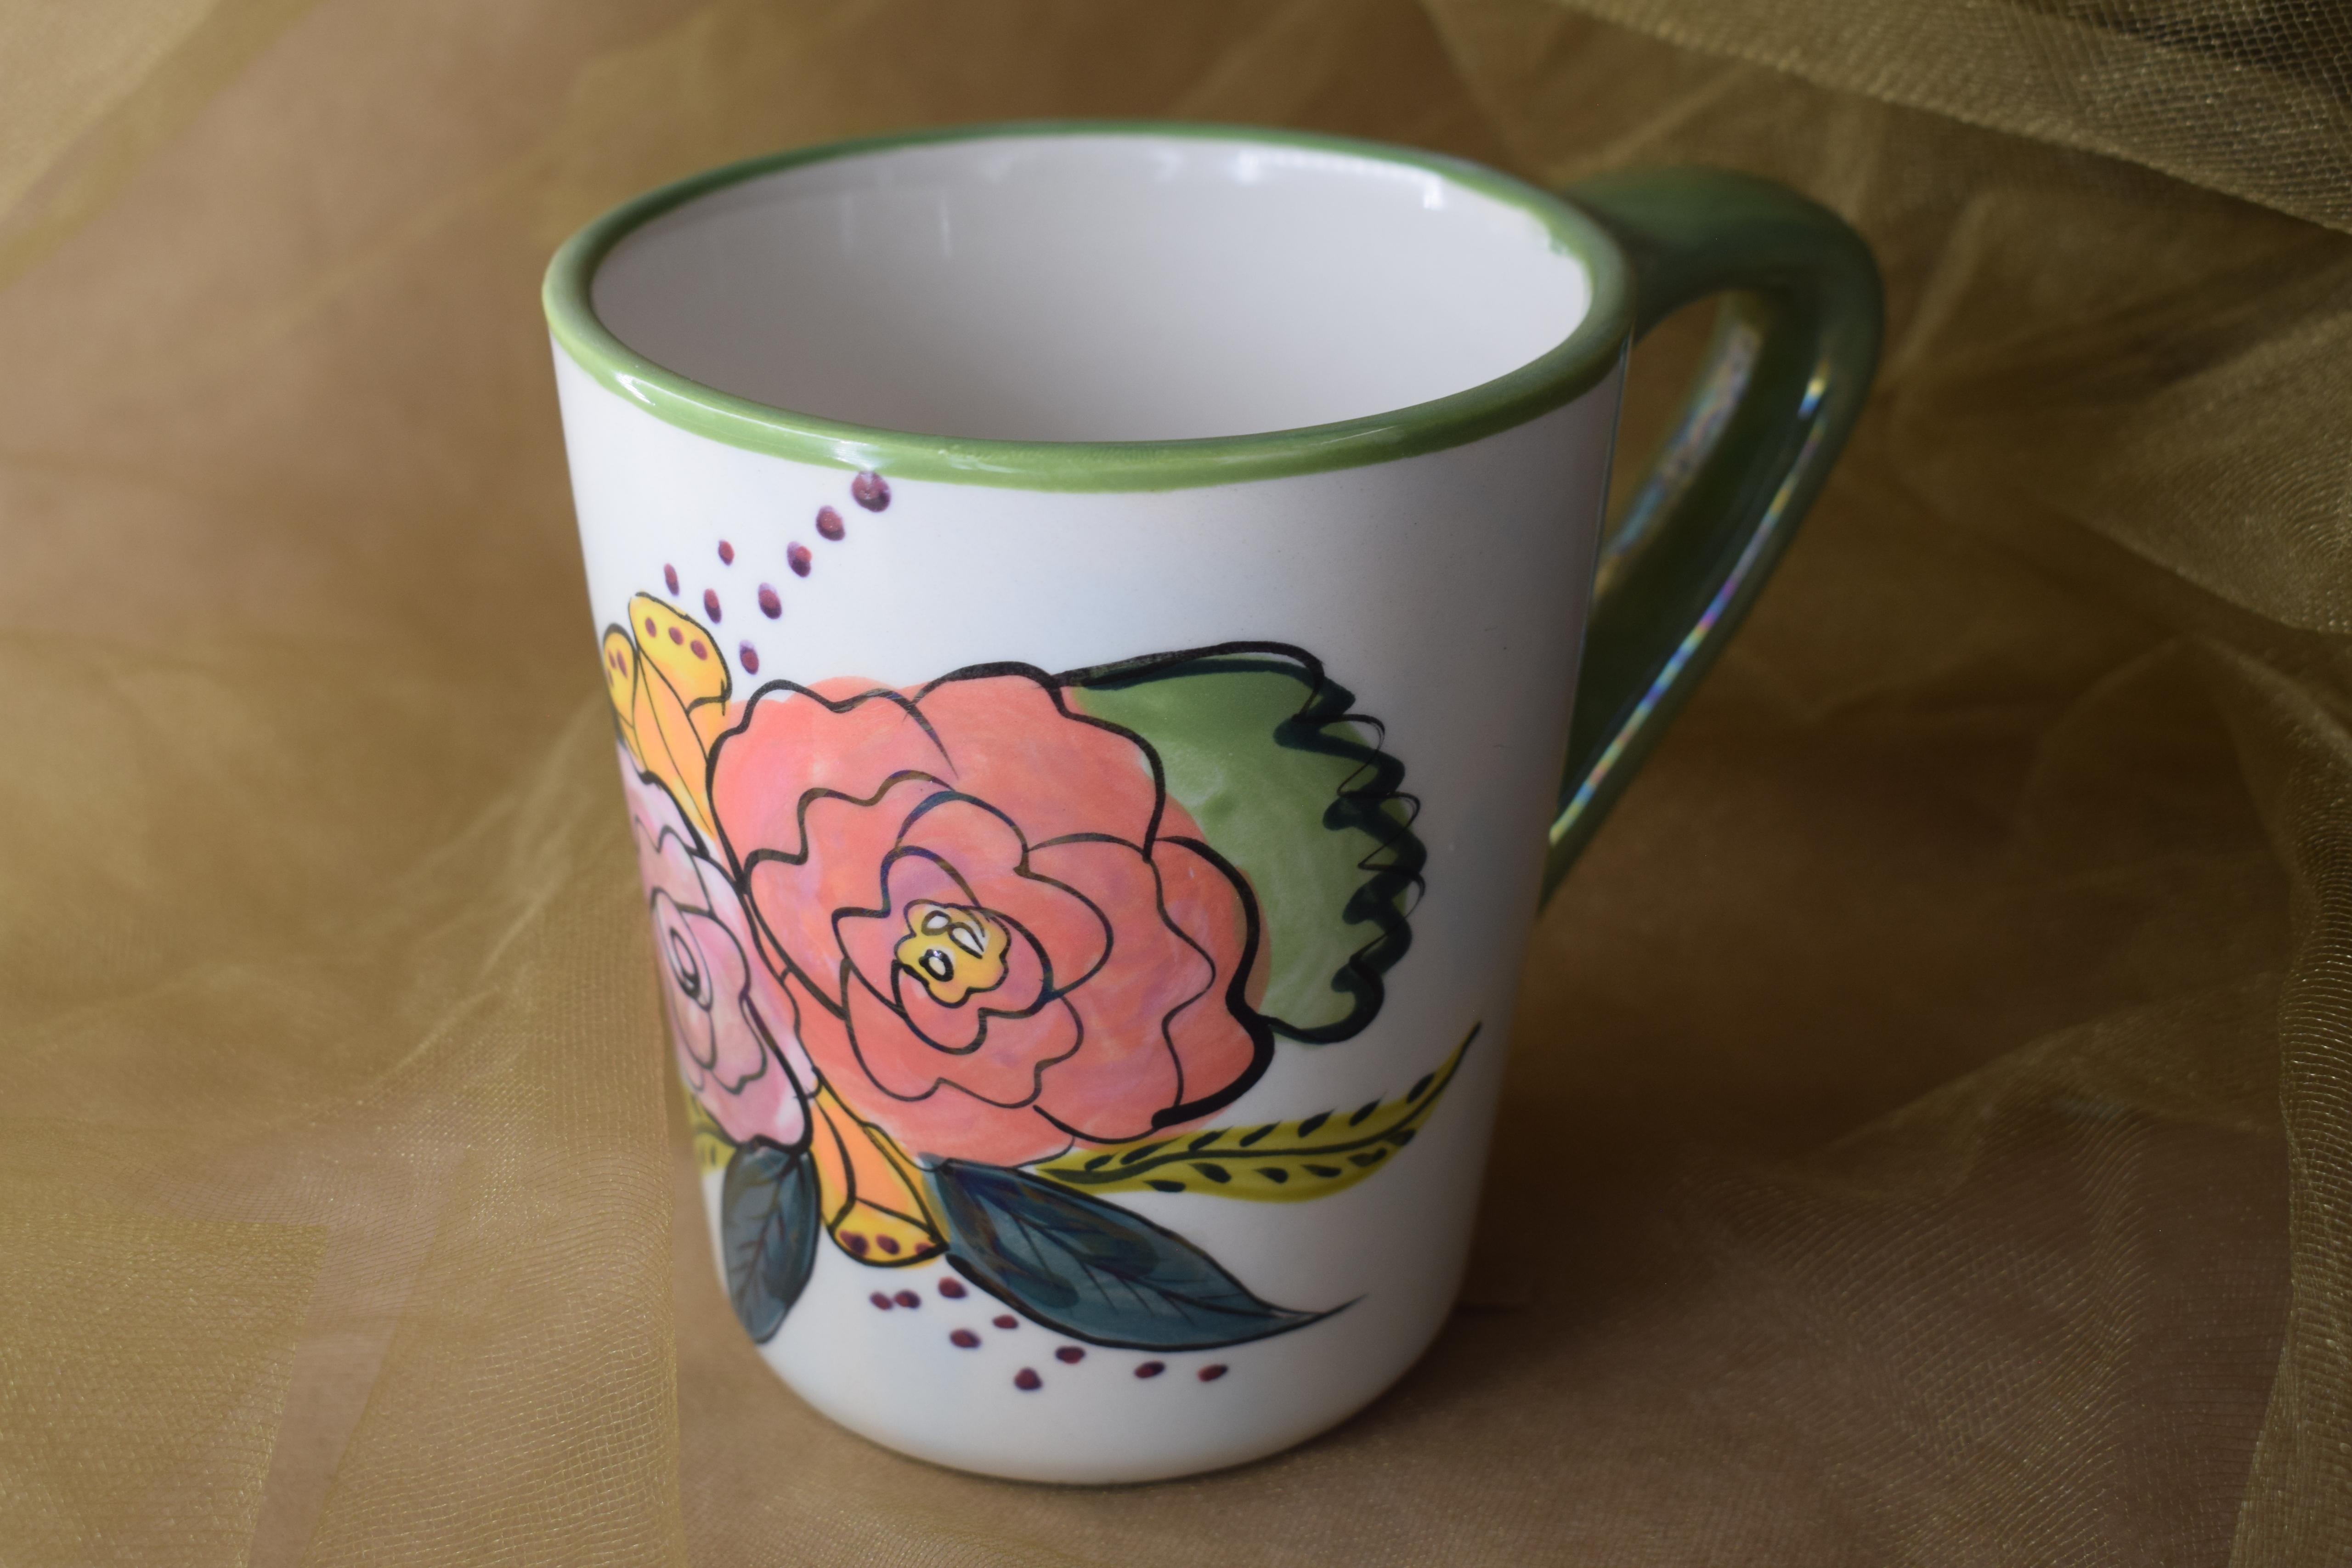 (AM04-JF) 12 oz. Angled Mug- Jenna Floral